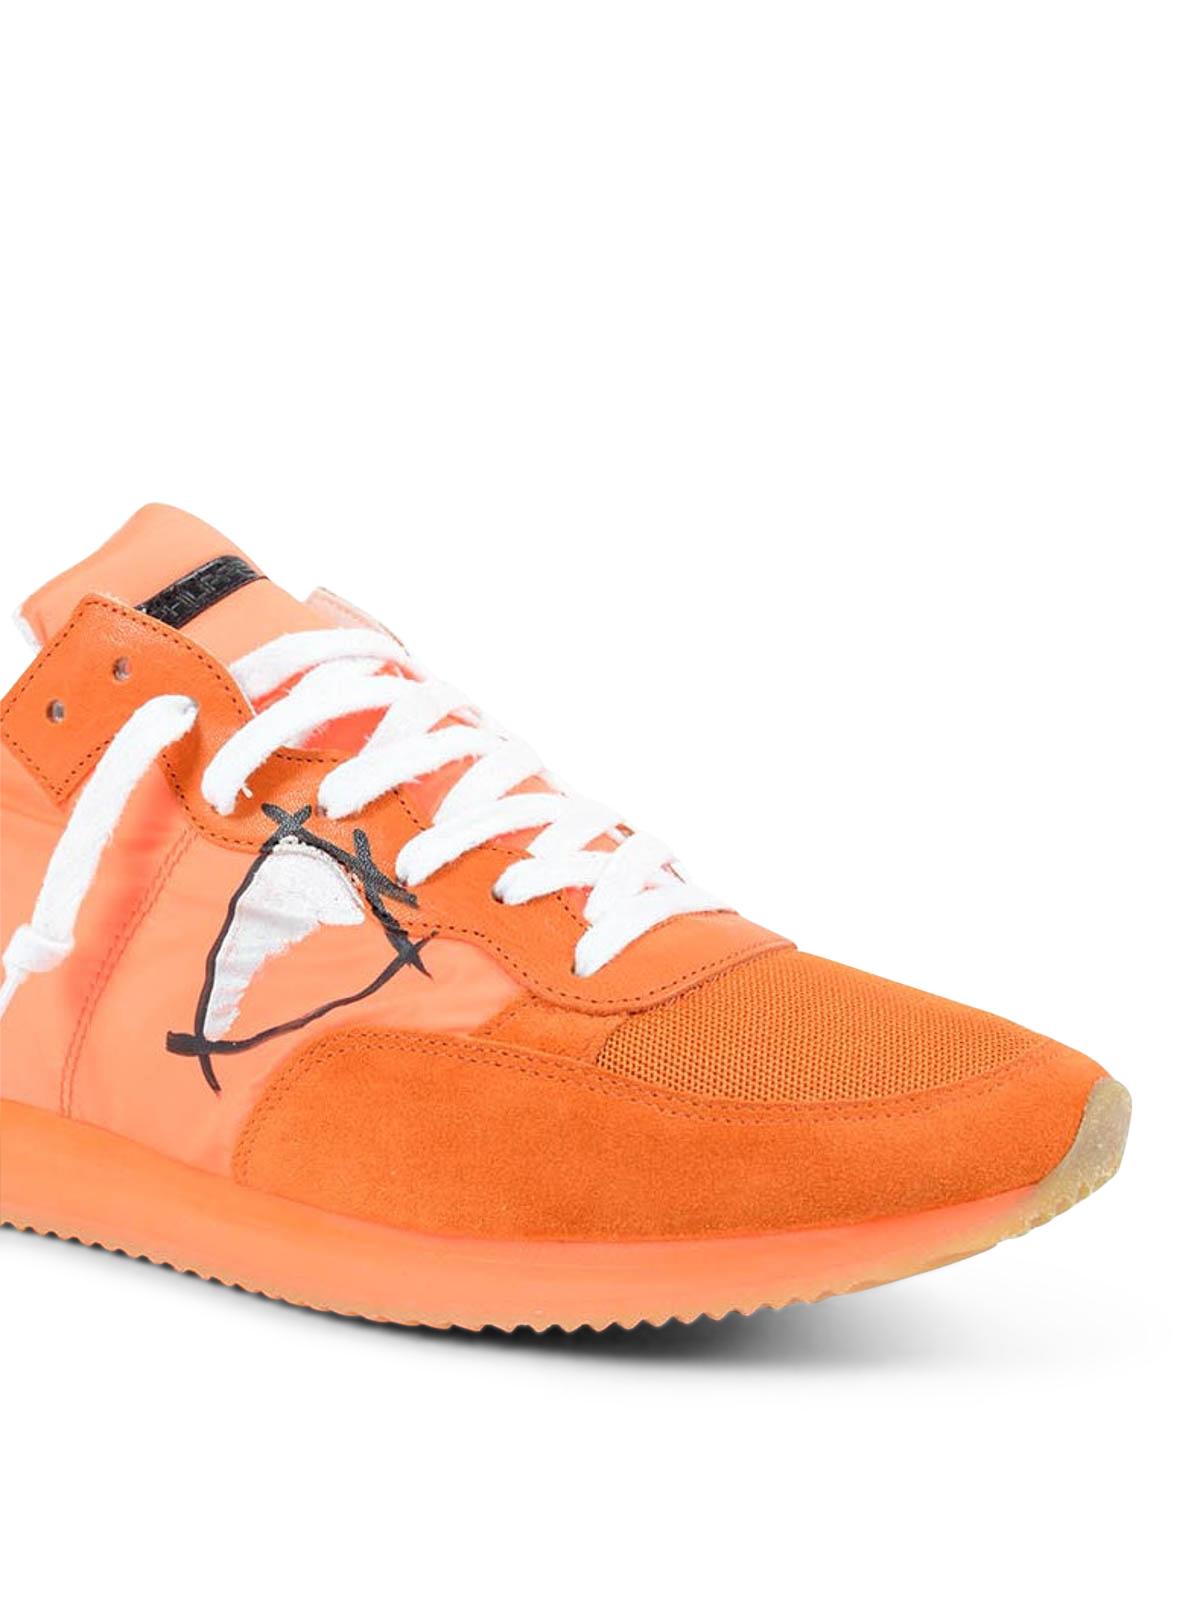 Neon orange Tropez sneakers Philippe Model w3TA4xqmo9